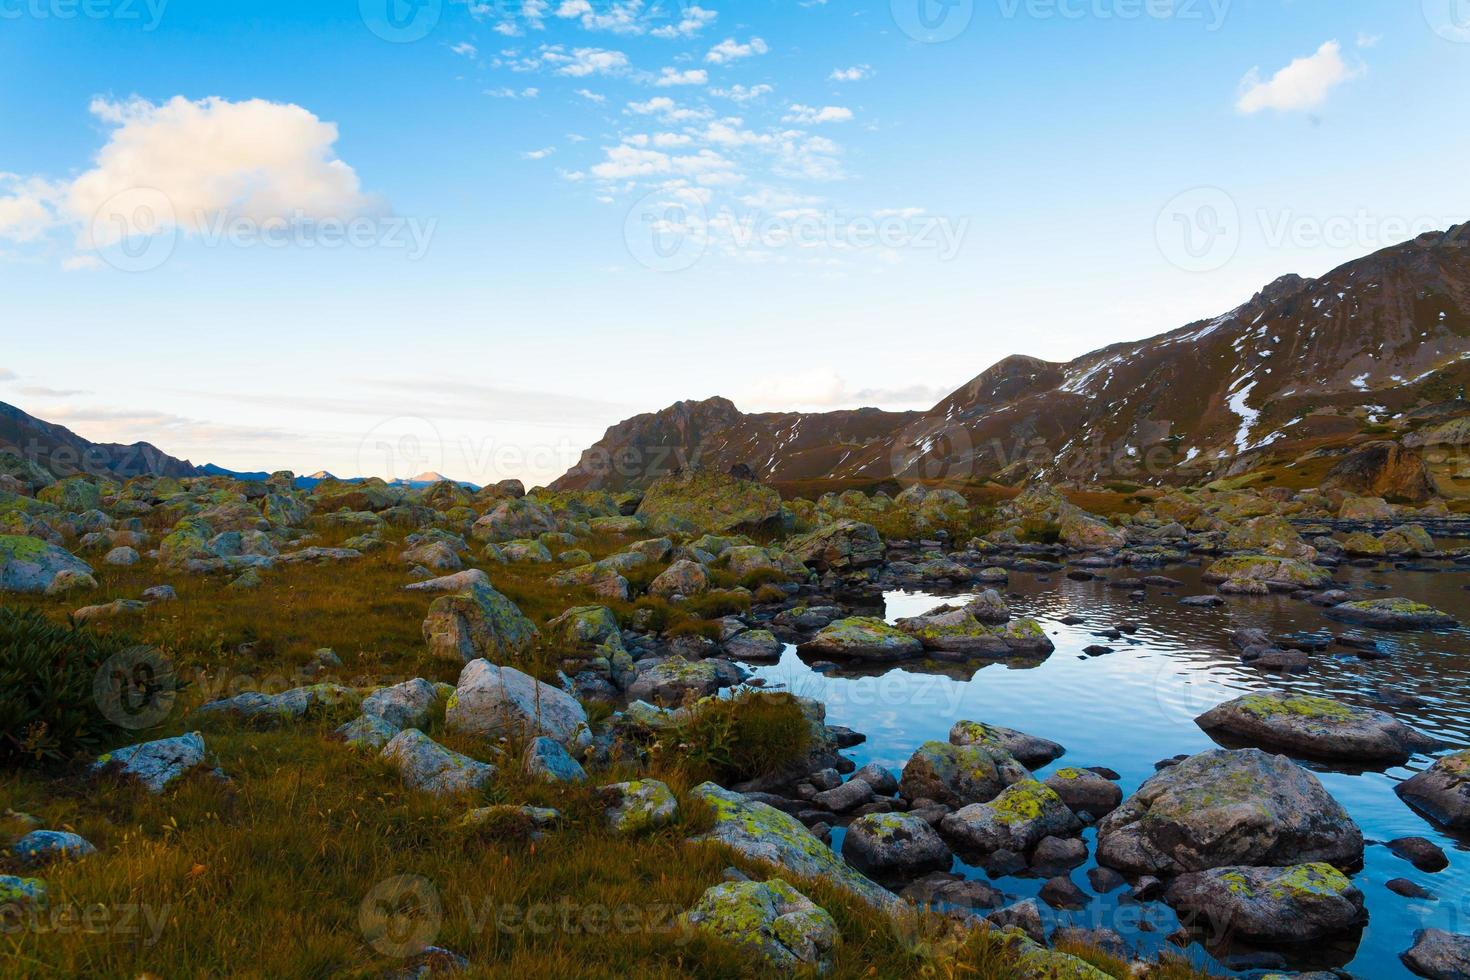 sjön solnedgång höst foto